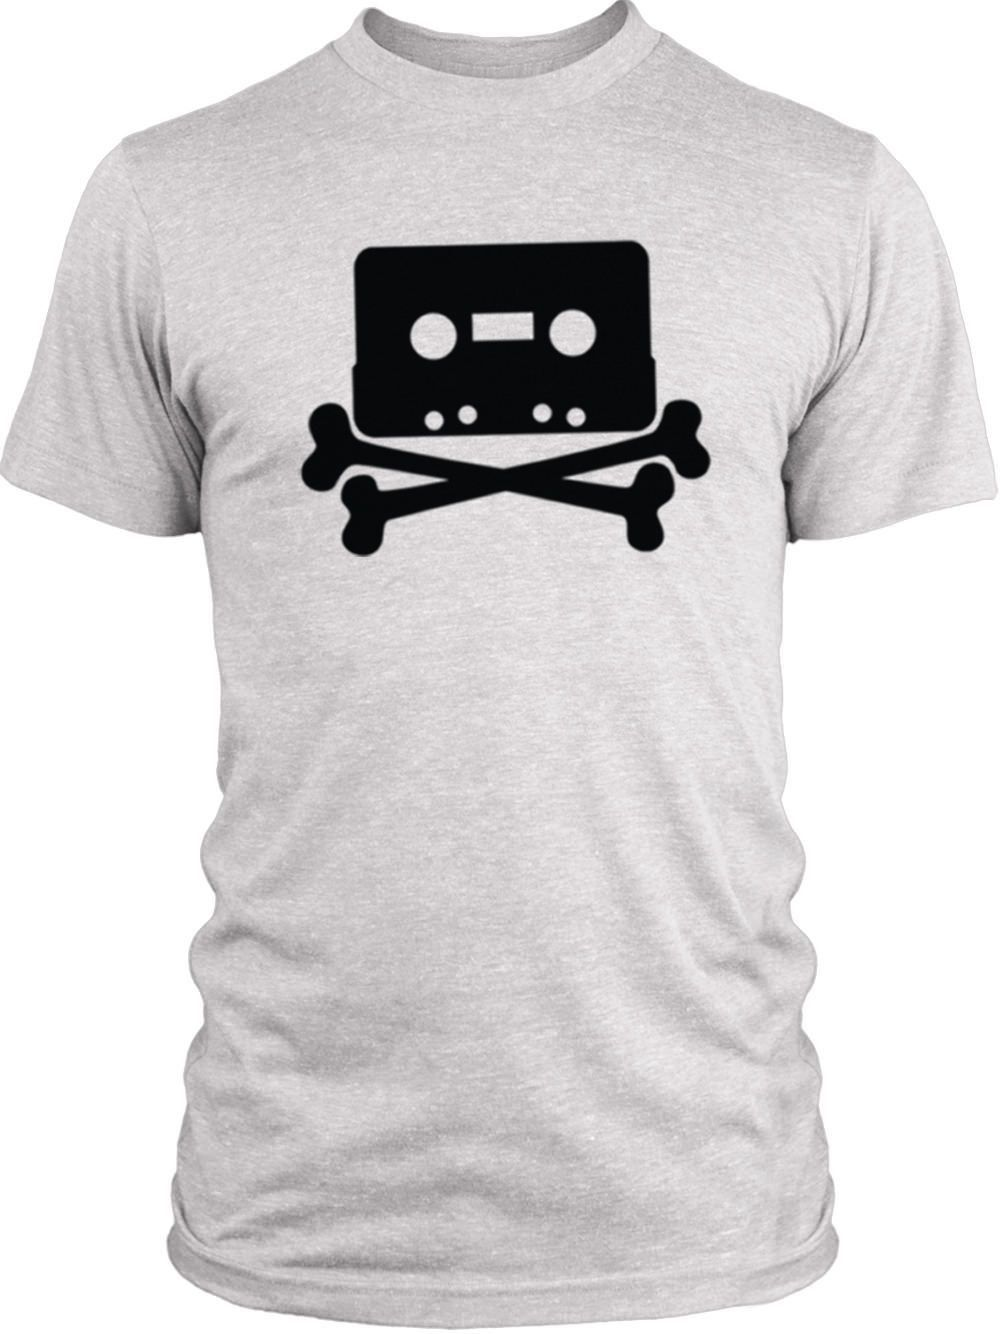 Big Texas The Pirate Bay Tape n Crossbones (Black) Vintage Tri-Blend T-Shirt